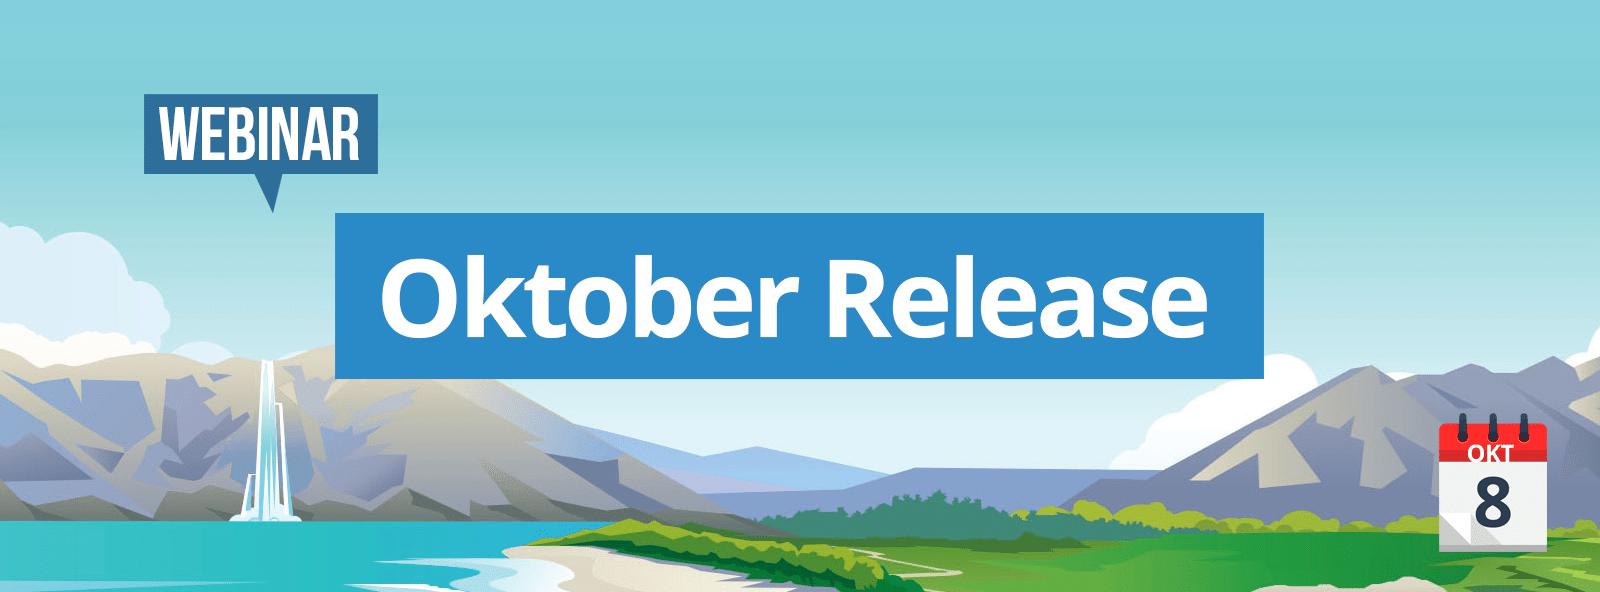 Webinar oktober release Netive VMS